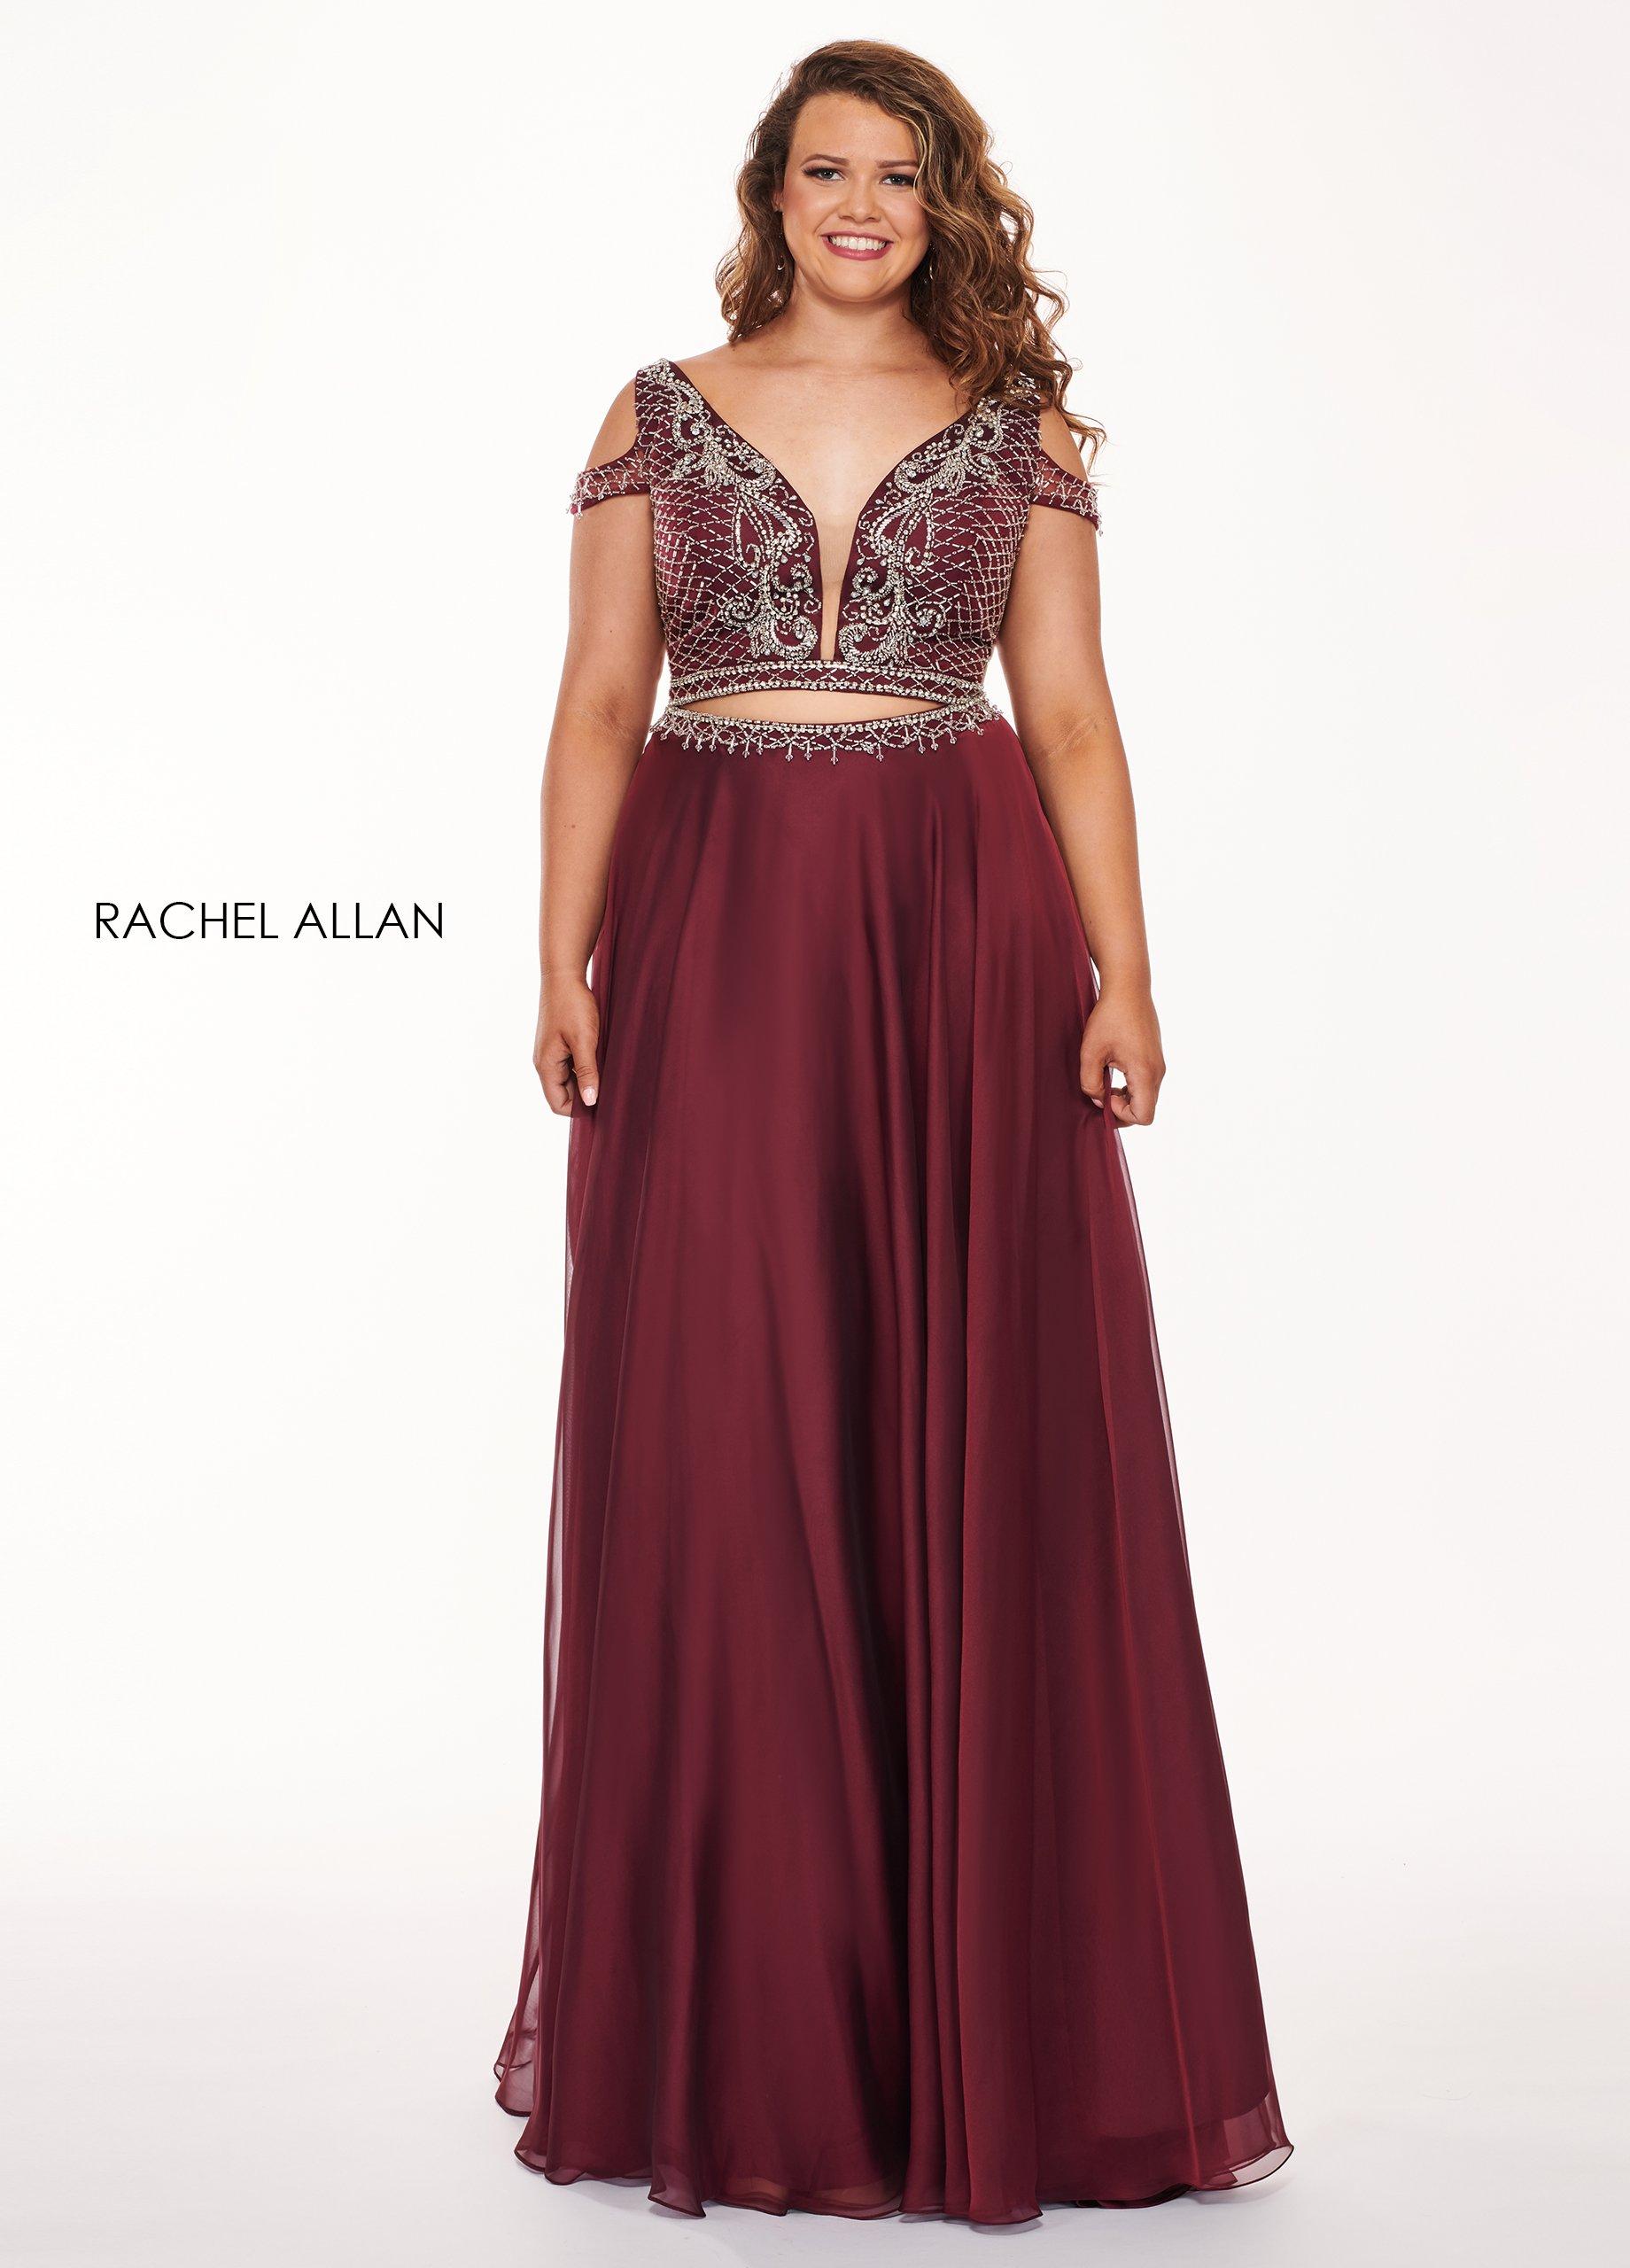 Rachel Allan Curves - 6693 Two Piece Beaded Chiffon A-line Dress